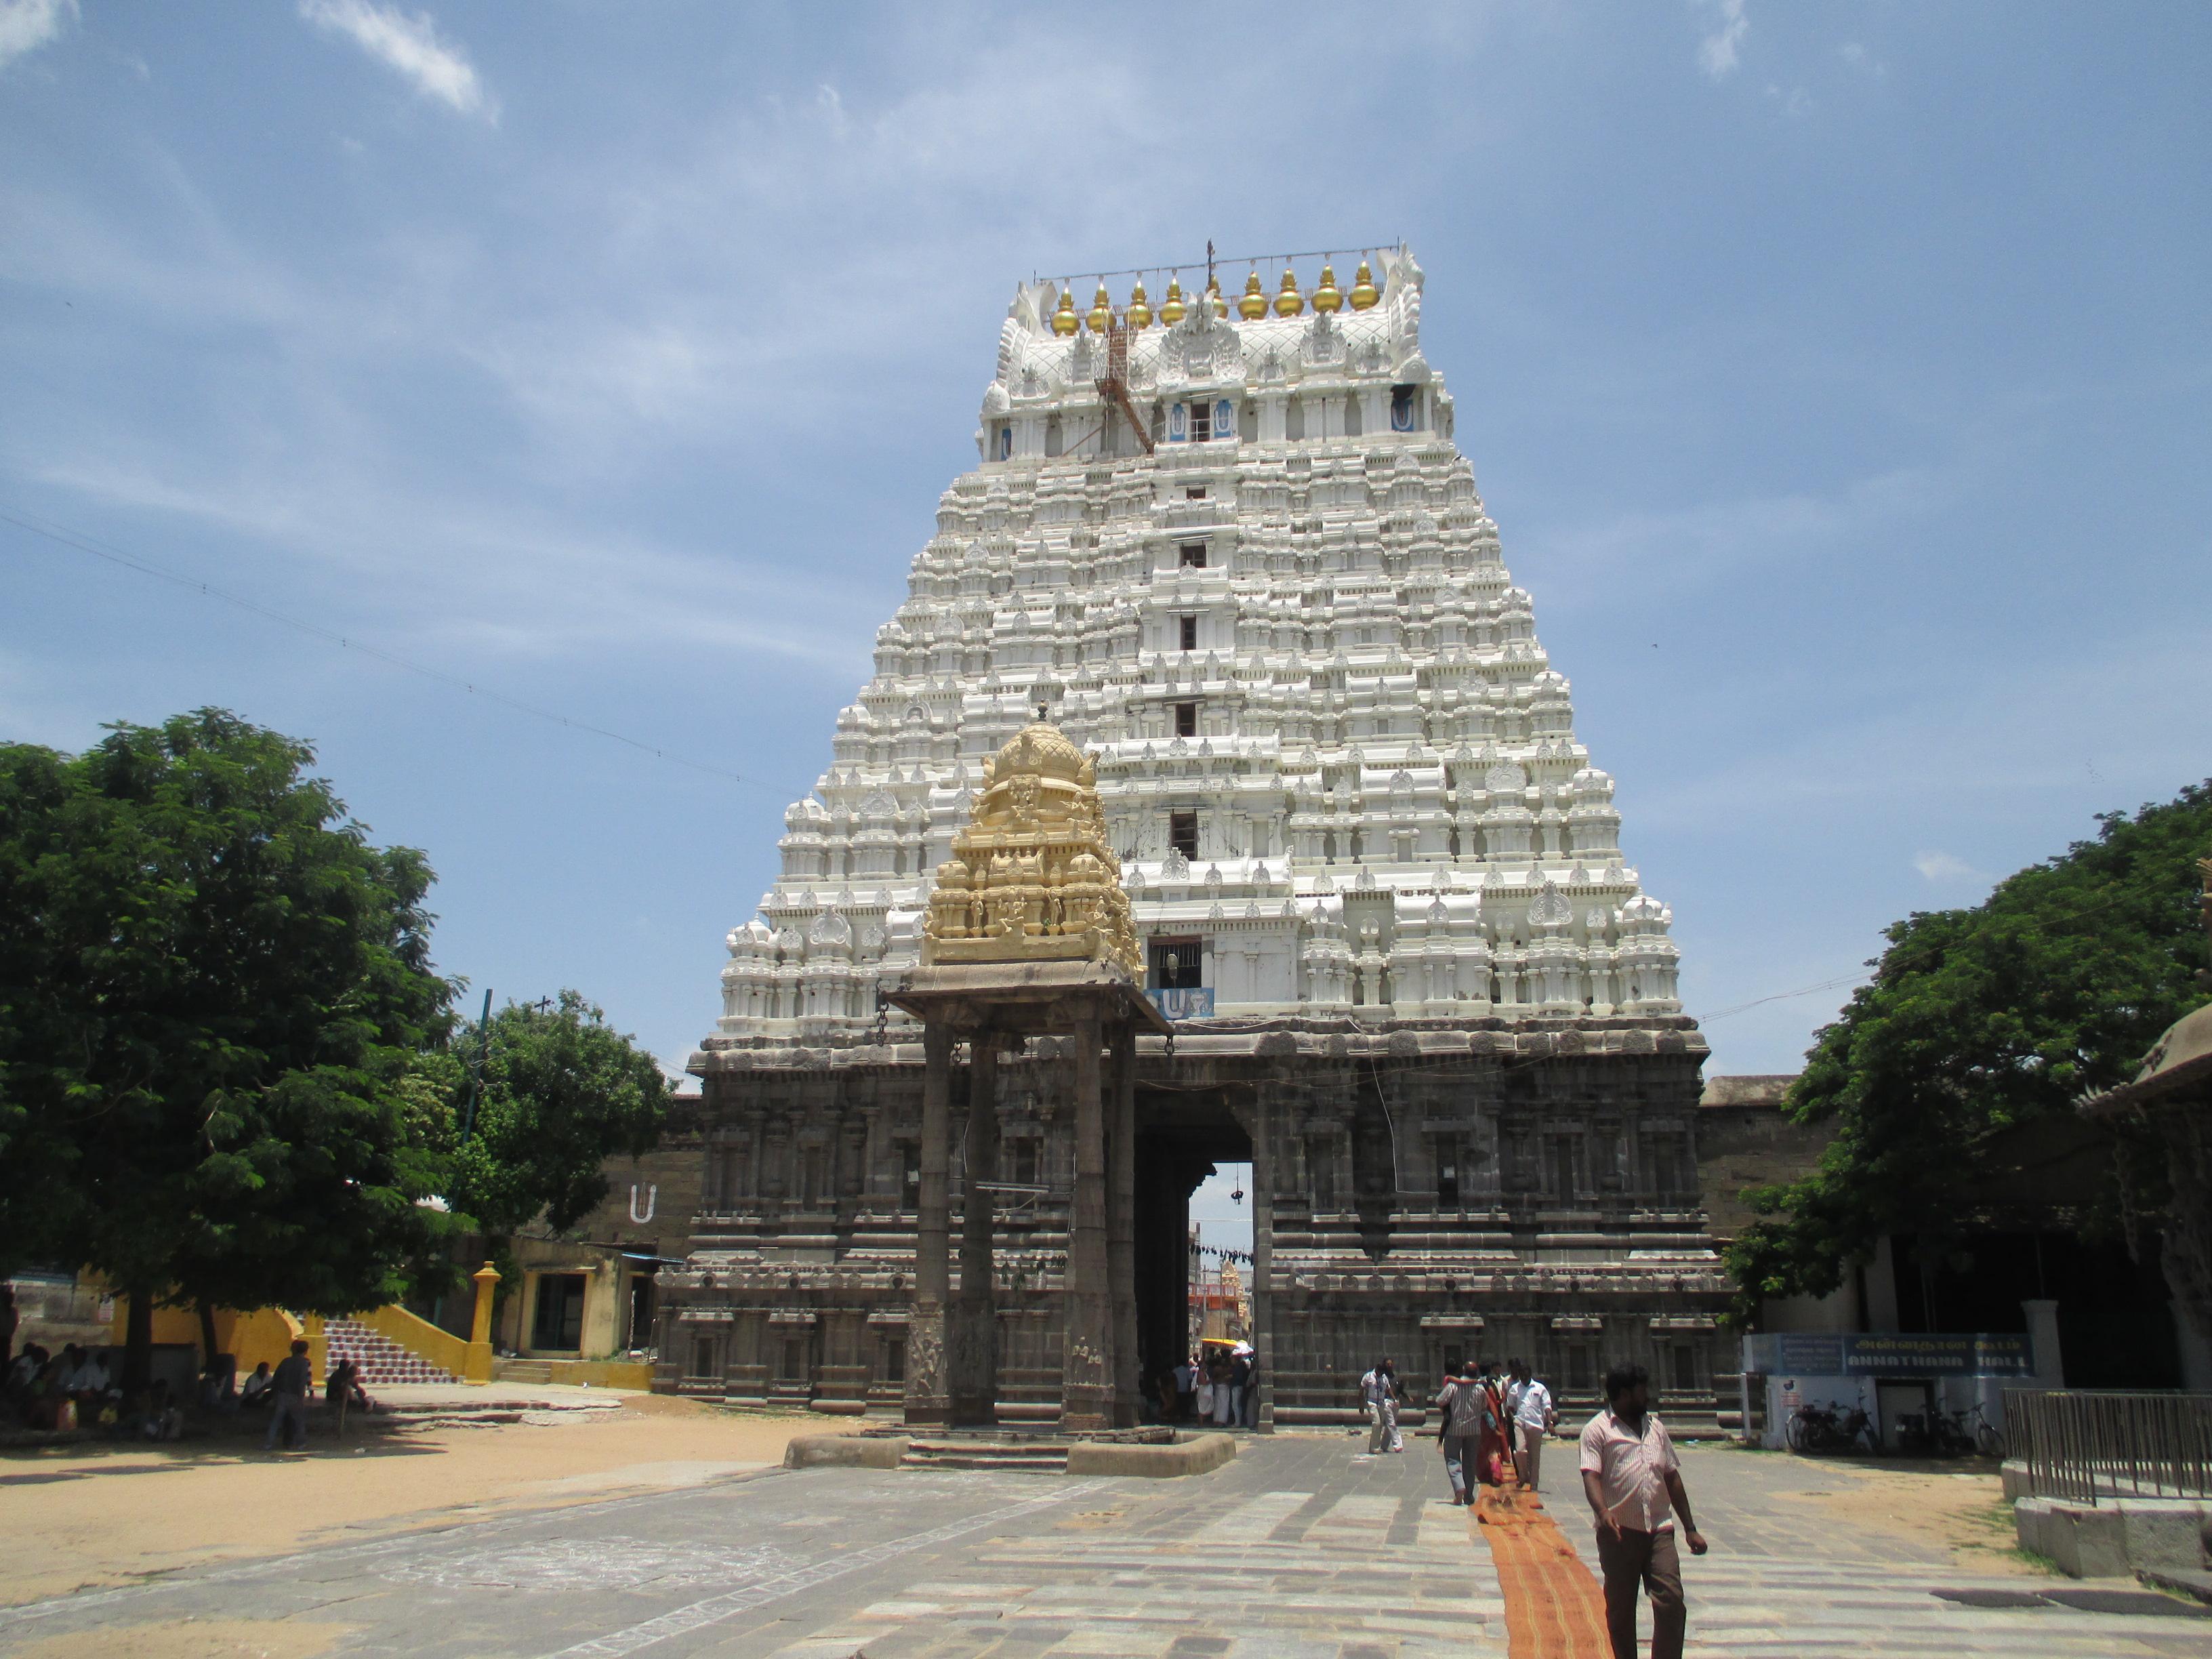 Varadharaja Perumal temple, one of the famous Kanchipuram Temples at Kanchipuram near Chennai